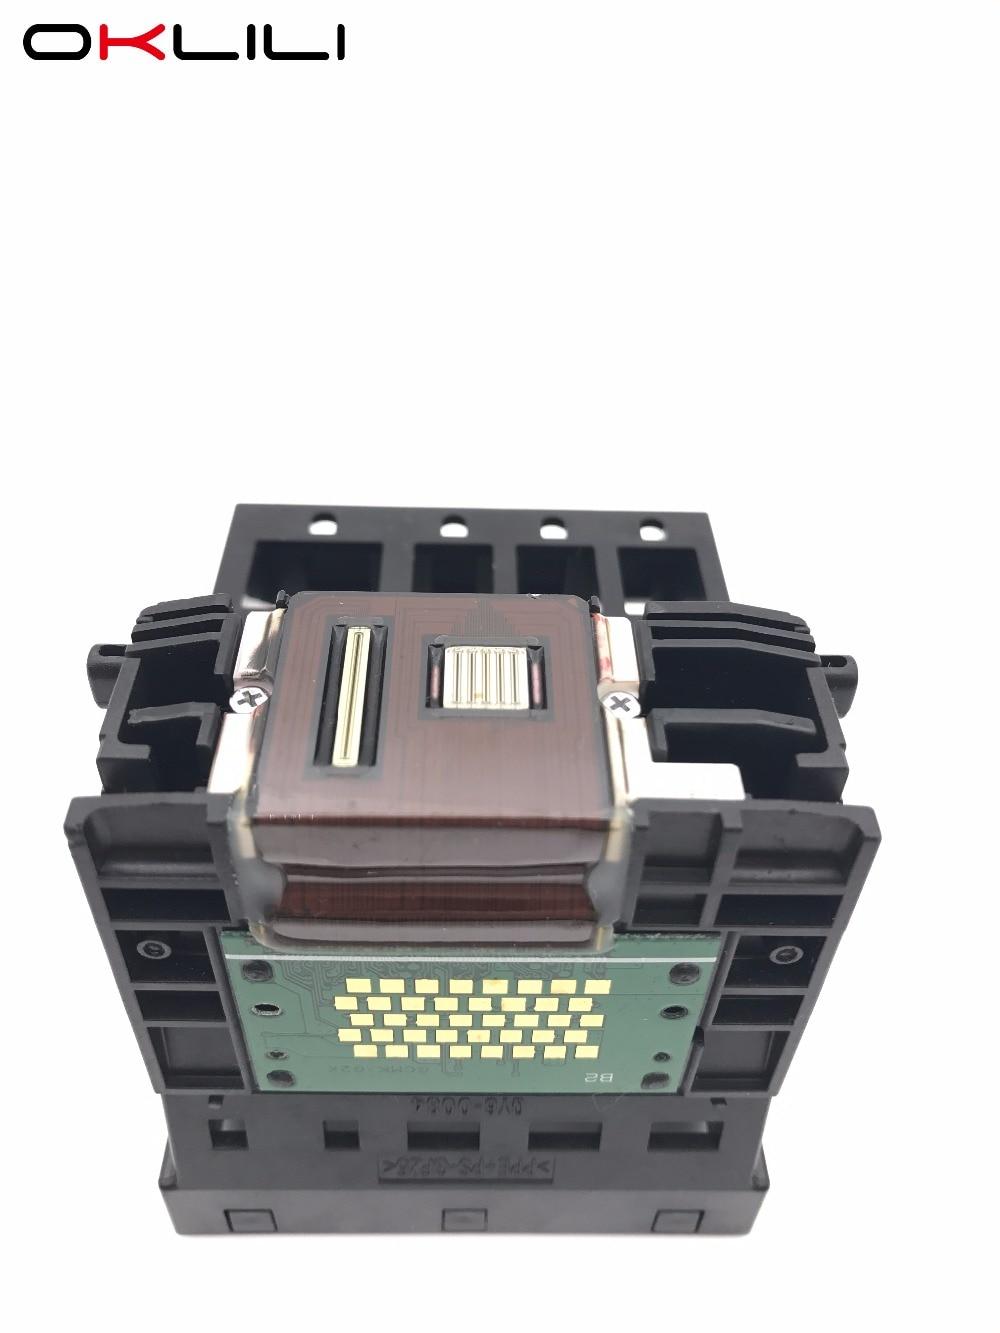 OKLILI ORIGINAL QY6-0034 Printhead Print Head for Canon S500 S520 S530D S600 S630 i6100 i6500 S6300 i650 MP F30 F50 C60 C70<br>